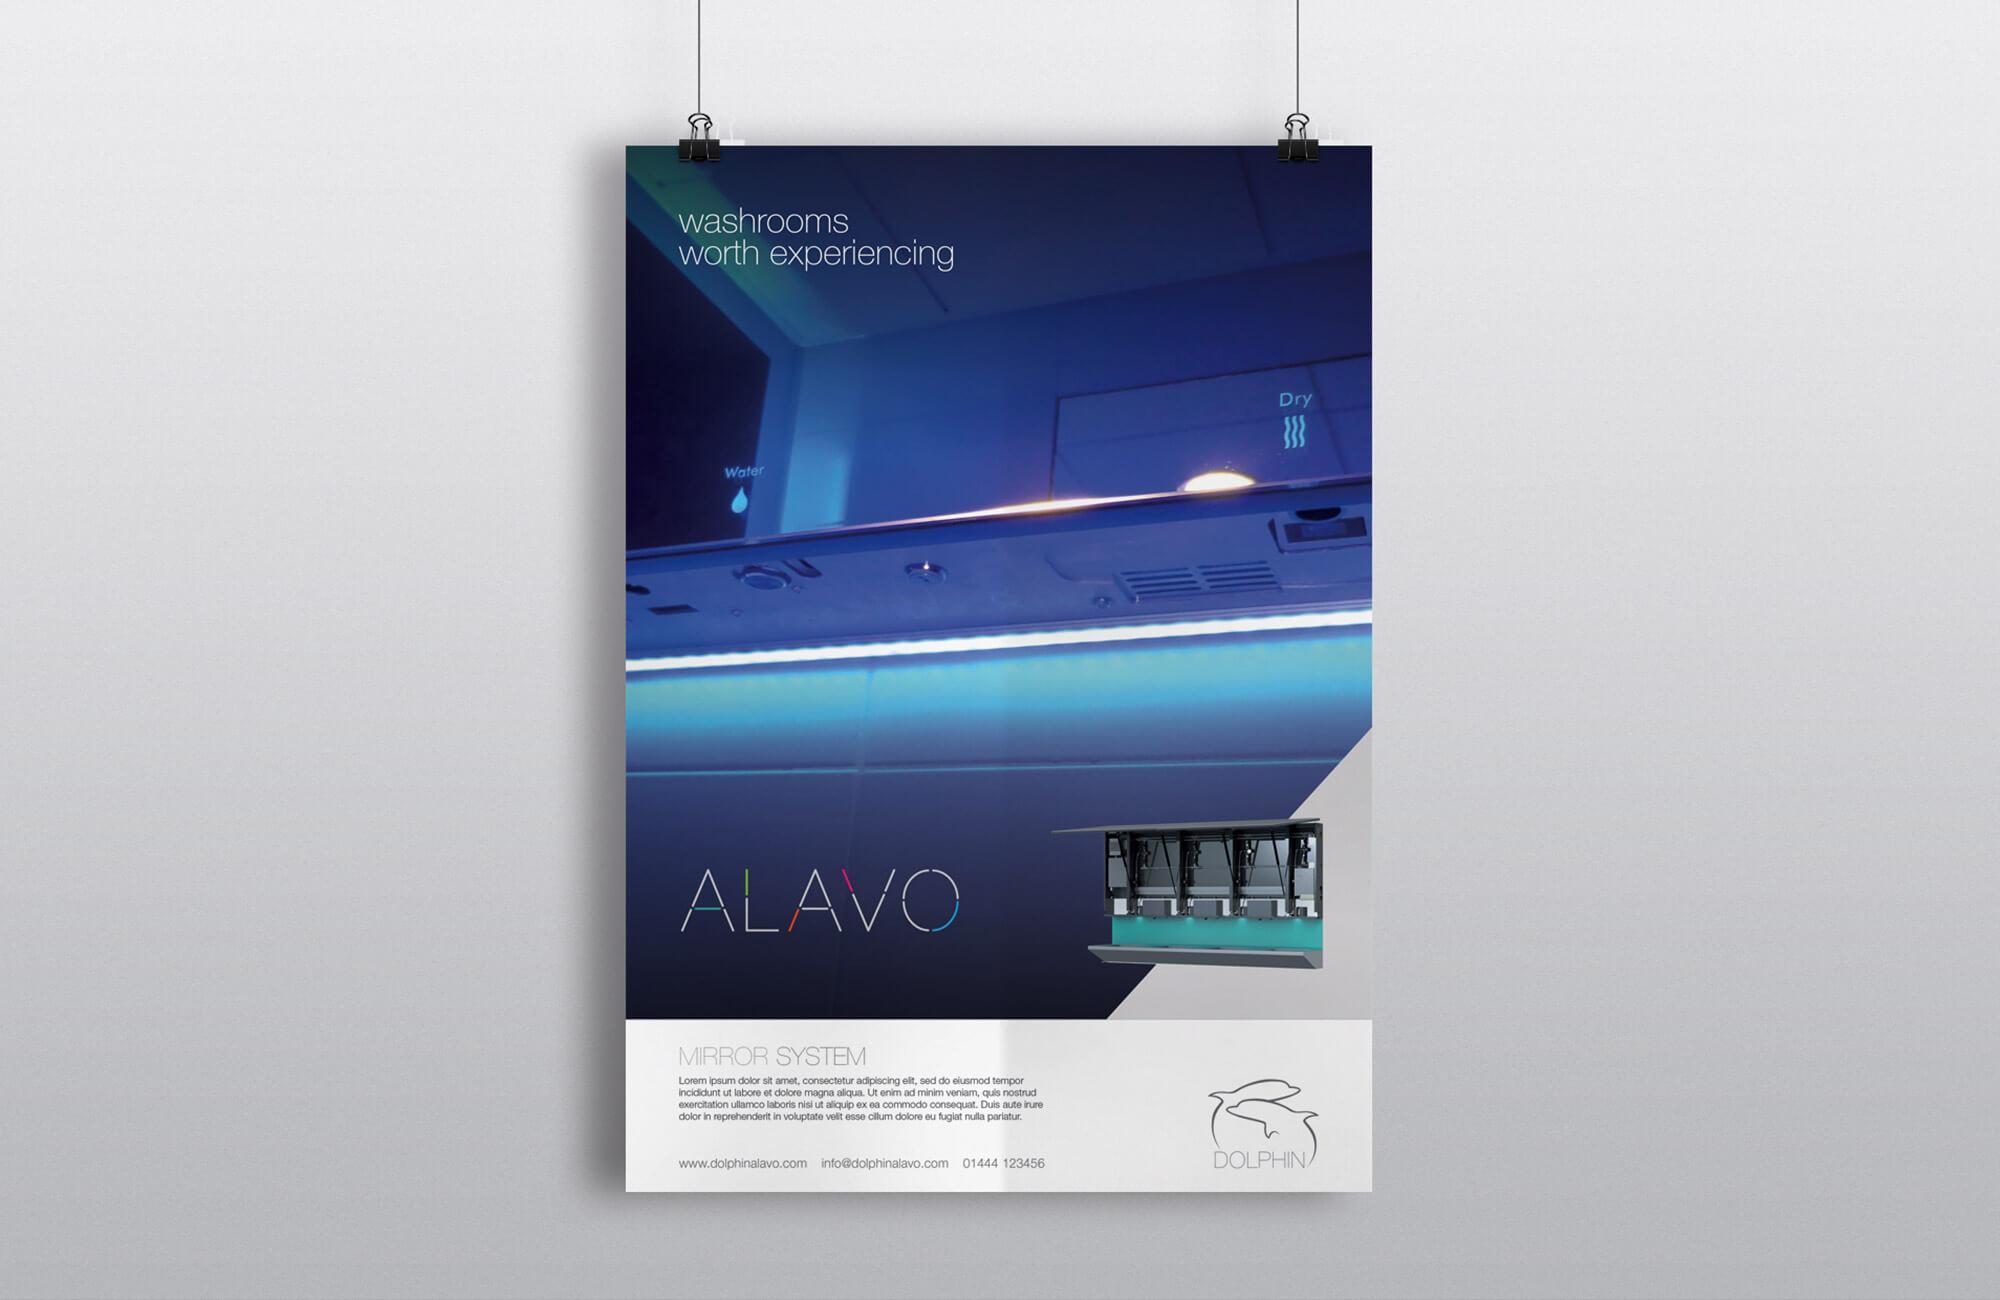 Alavo Poster Design Concept